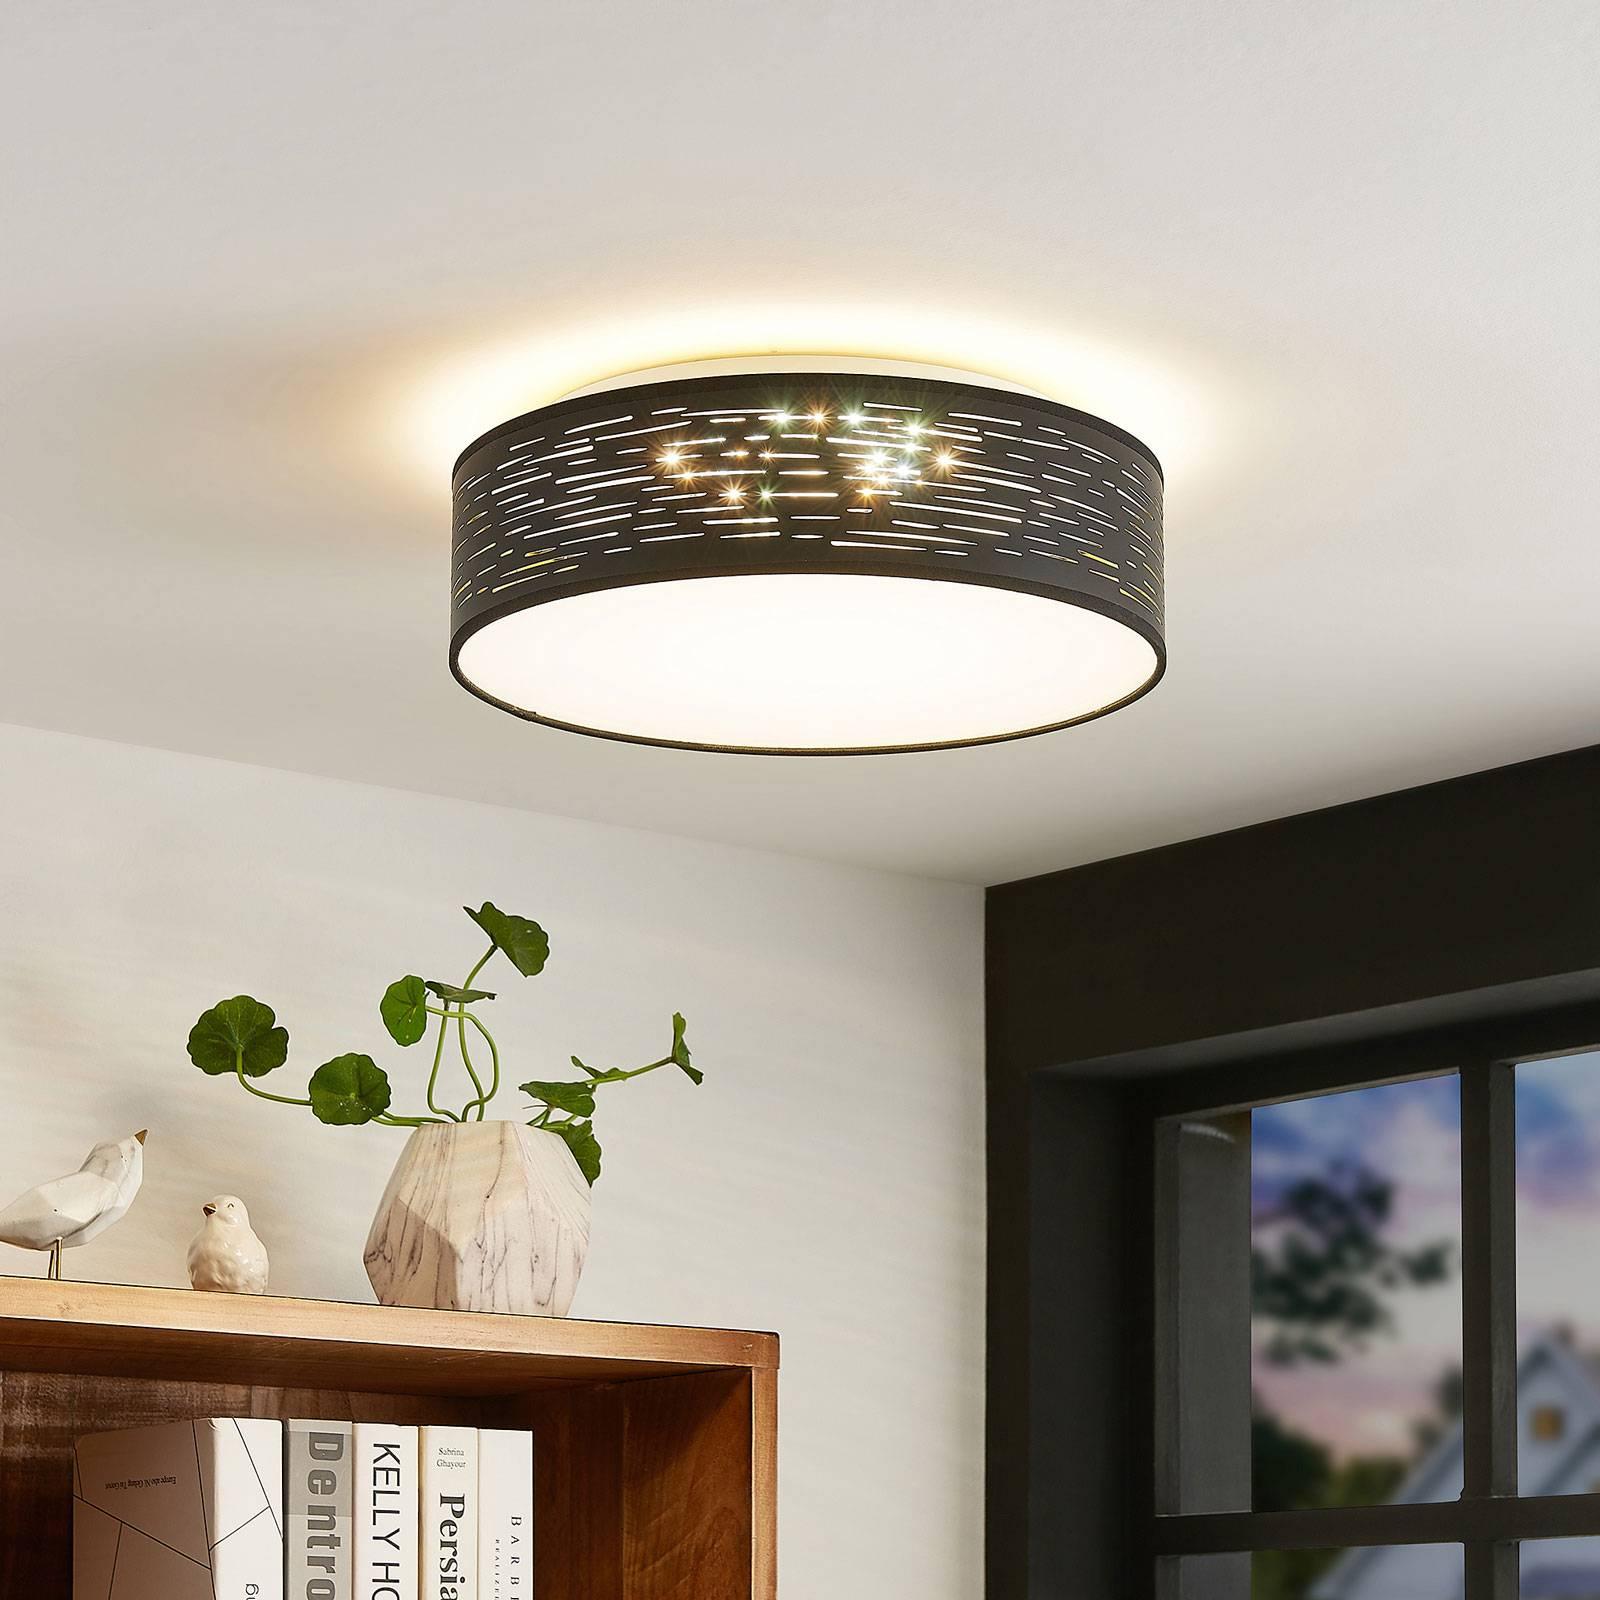 Lindby Iolyn LED plafondlamp, Ø 38cm